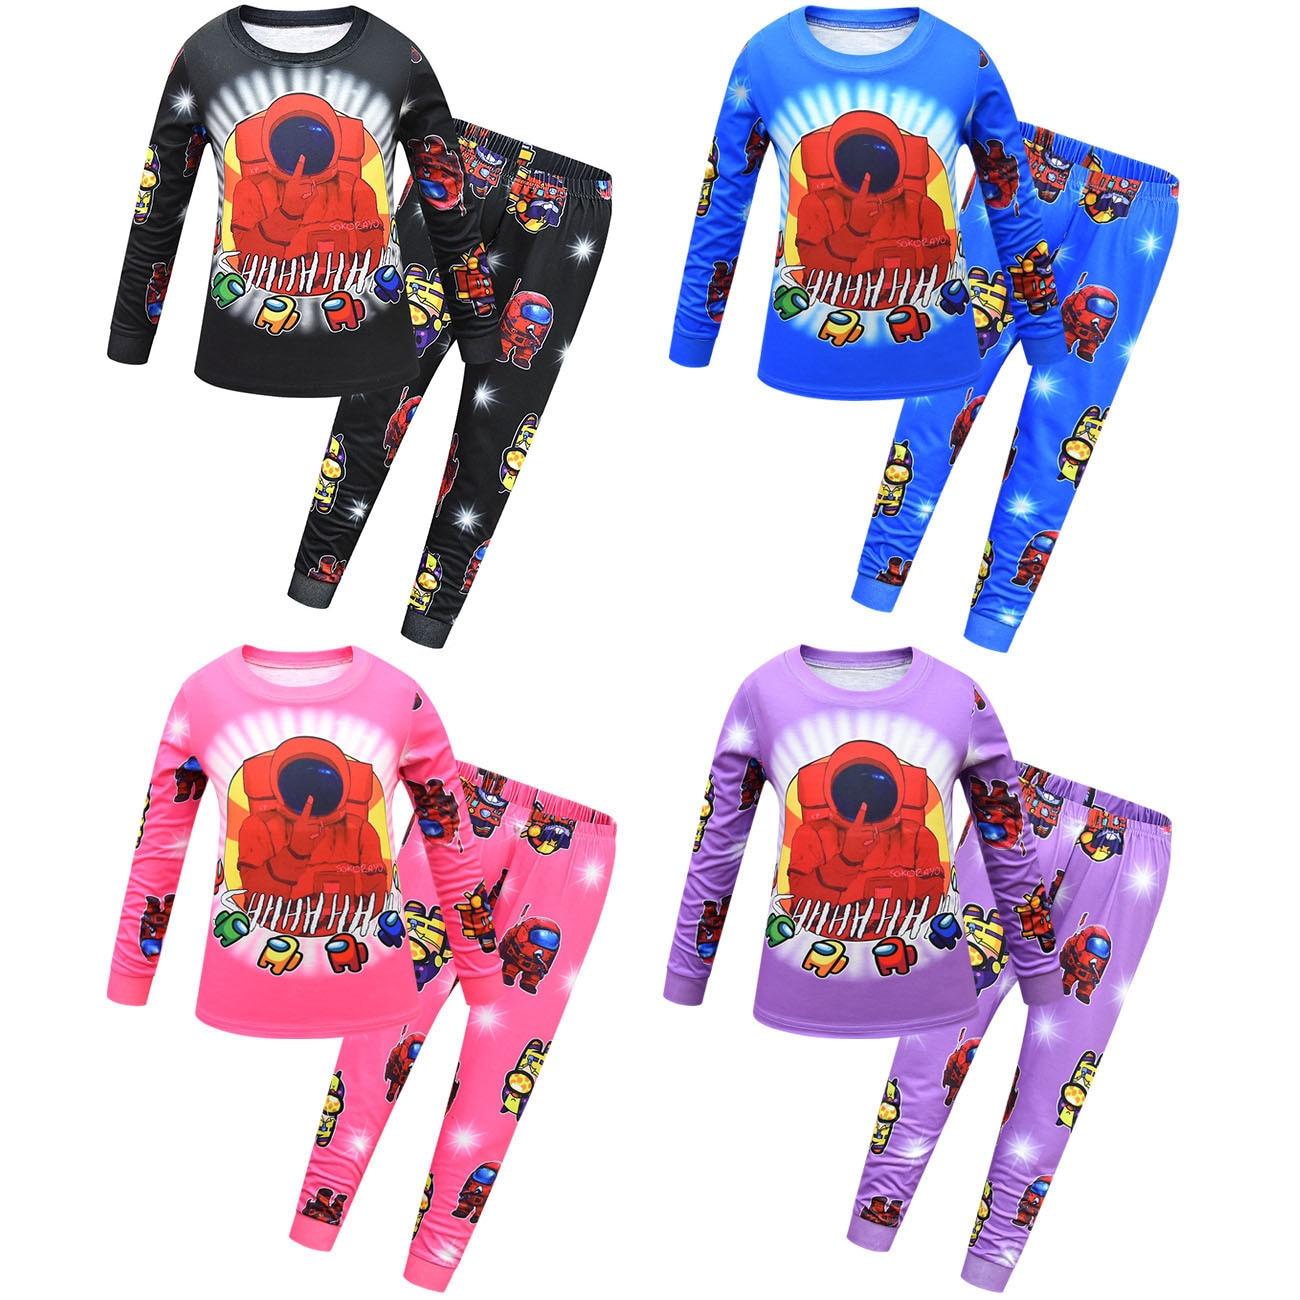 Snug Children Pajamas Clothing Set Kids 3D Print Among Us Video Game Cartoon Sleepwear Autumn Nightwear Boys Girls Pyjamas Set